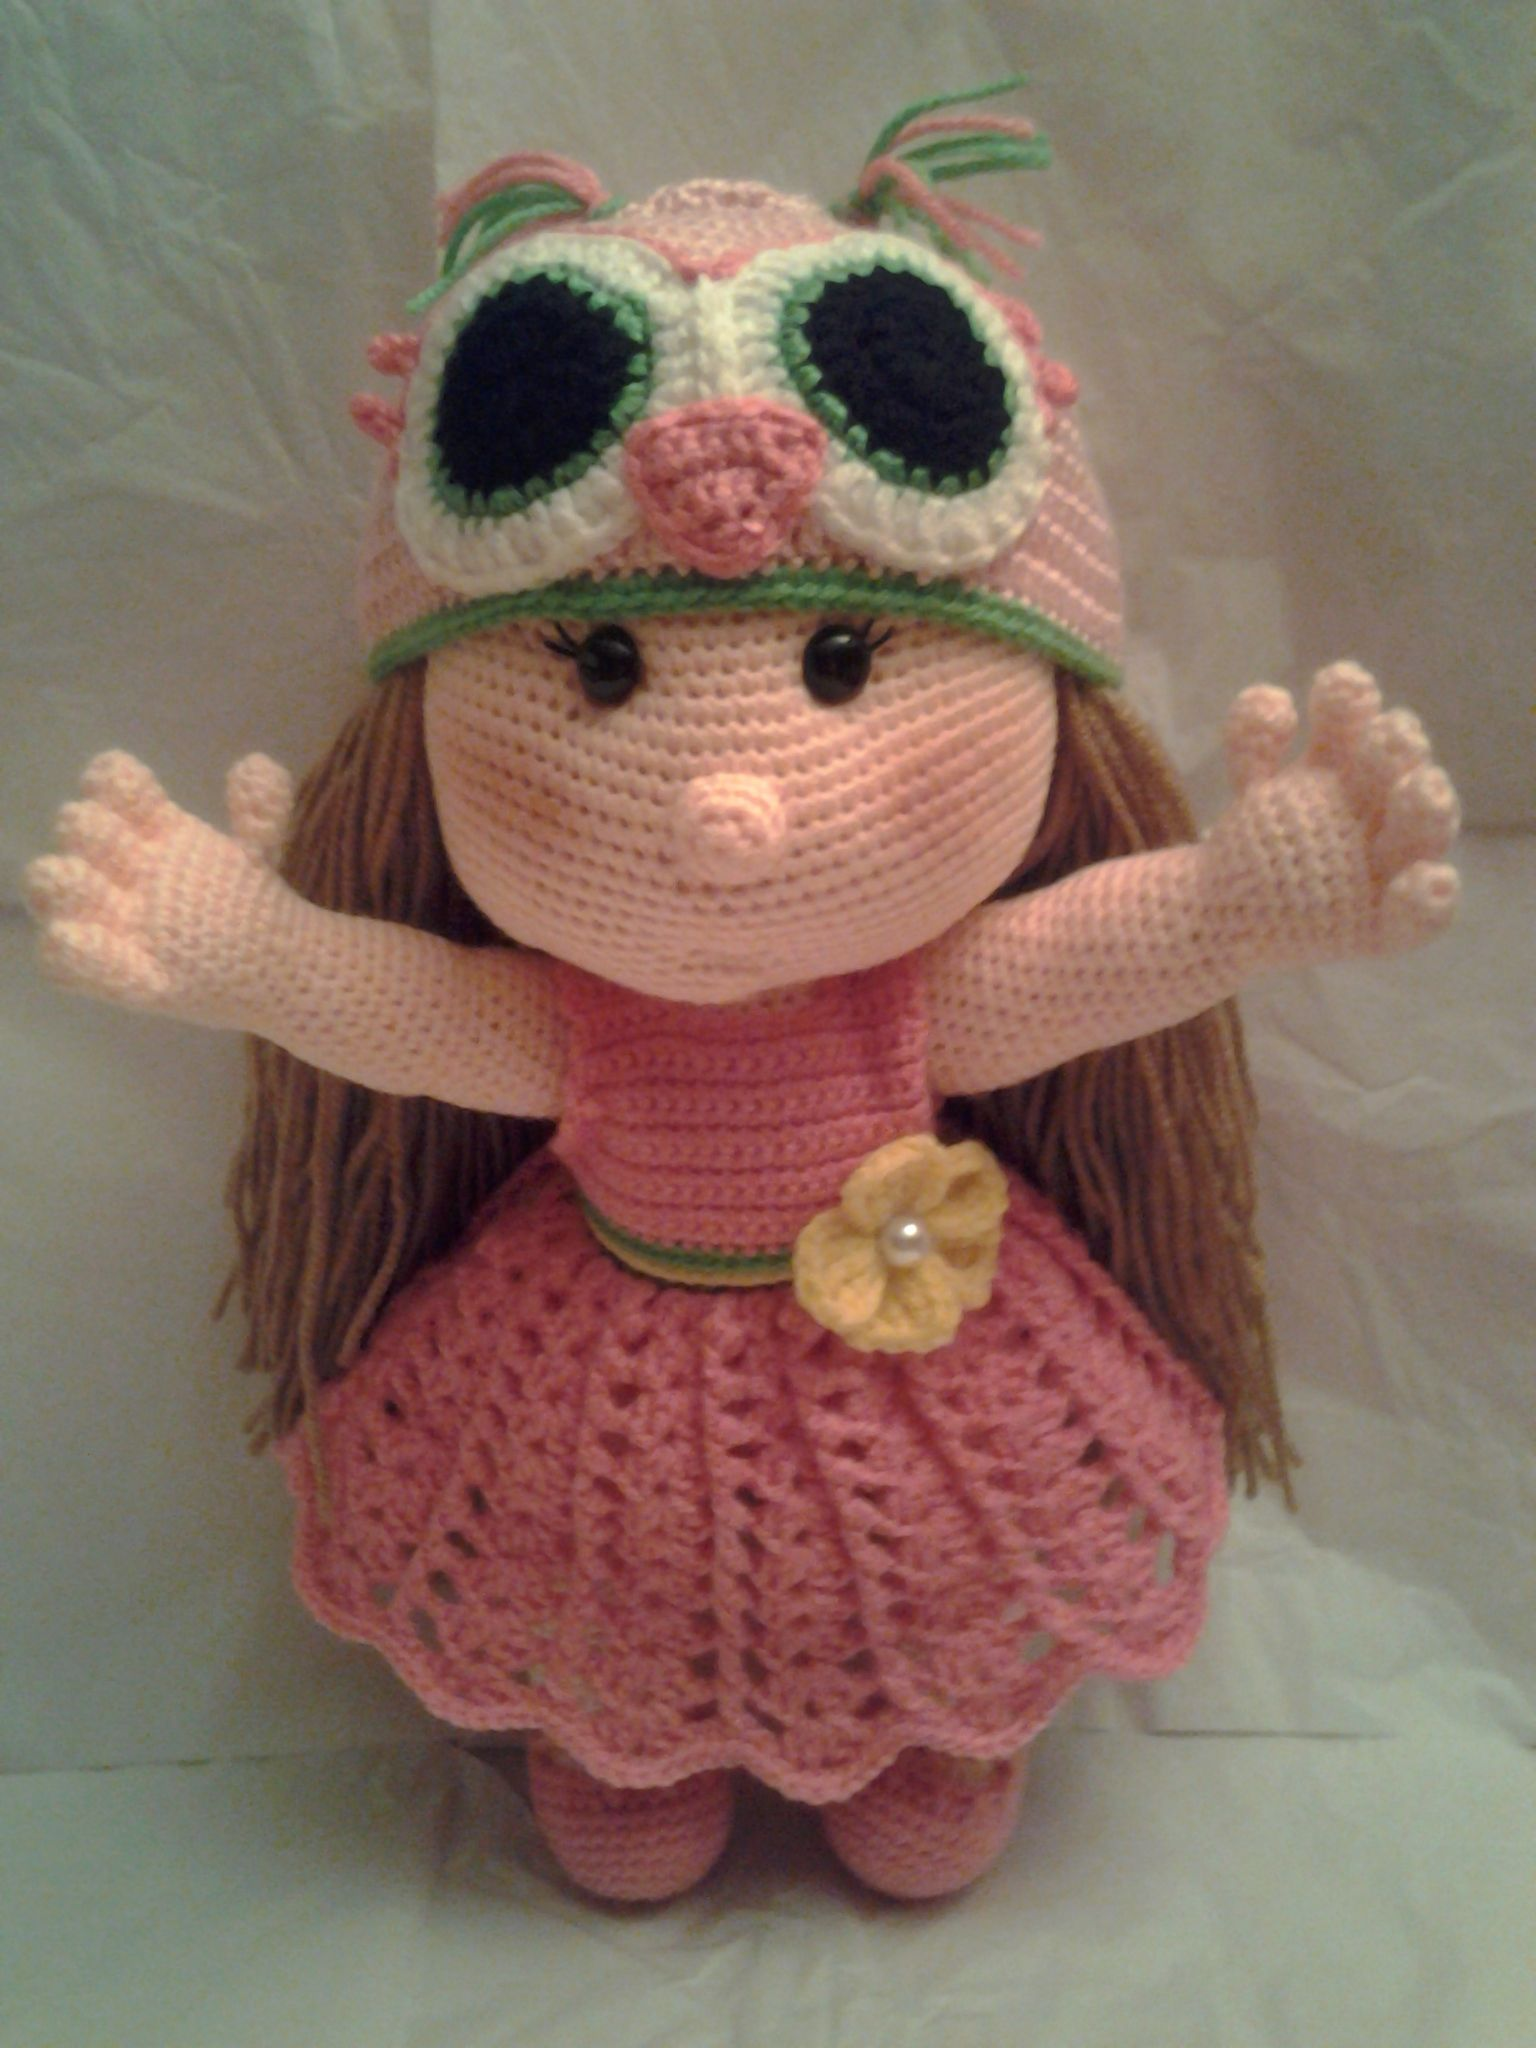 Amigurumi Crochet Hat Patterns : HAVANA - For Sale! Crochet Amigurumi Baby Girl Doll with ...